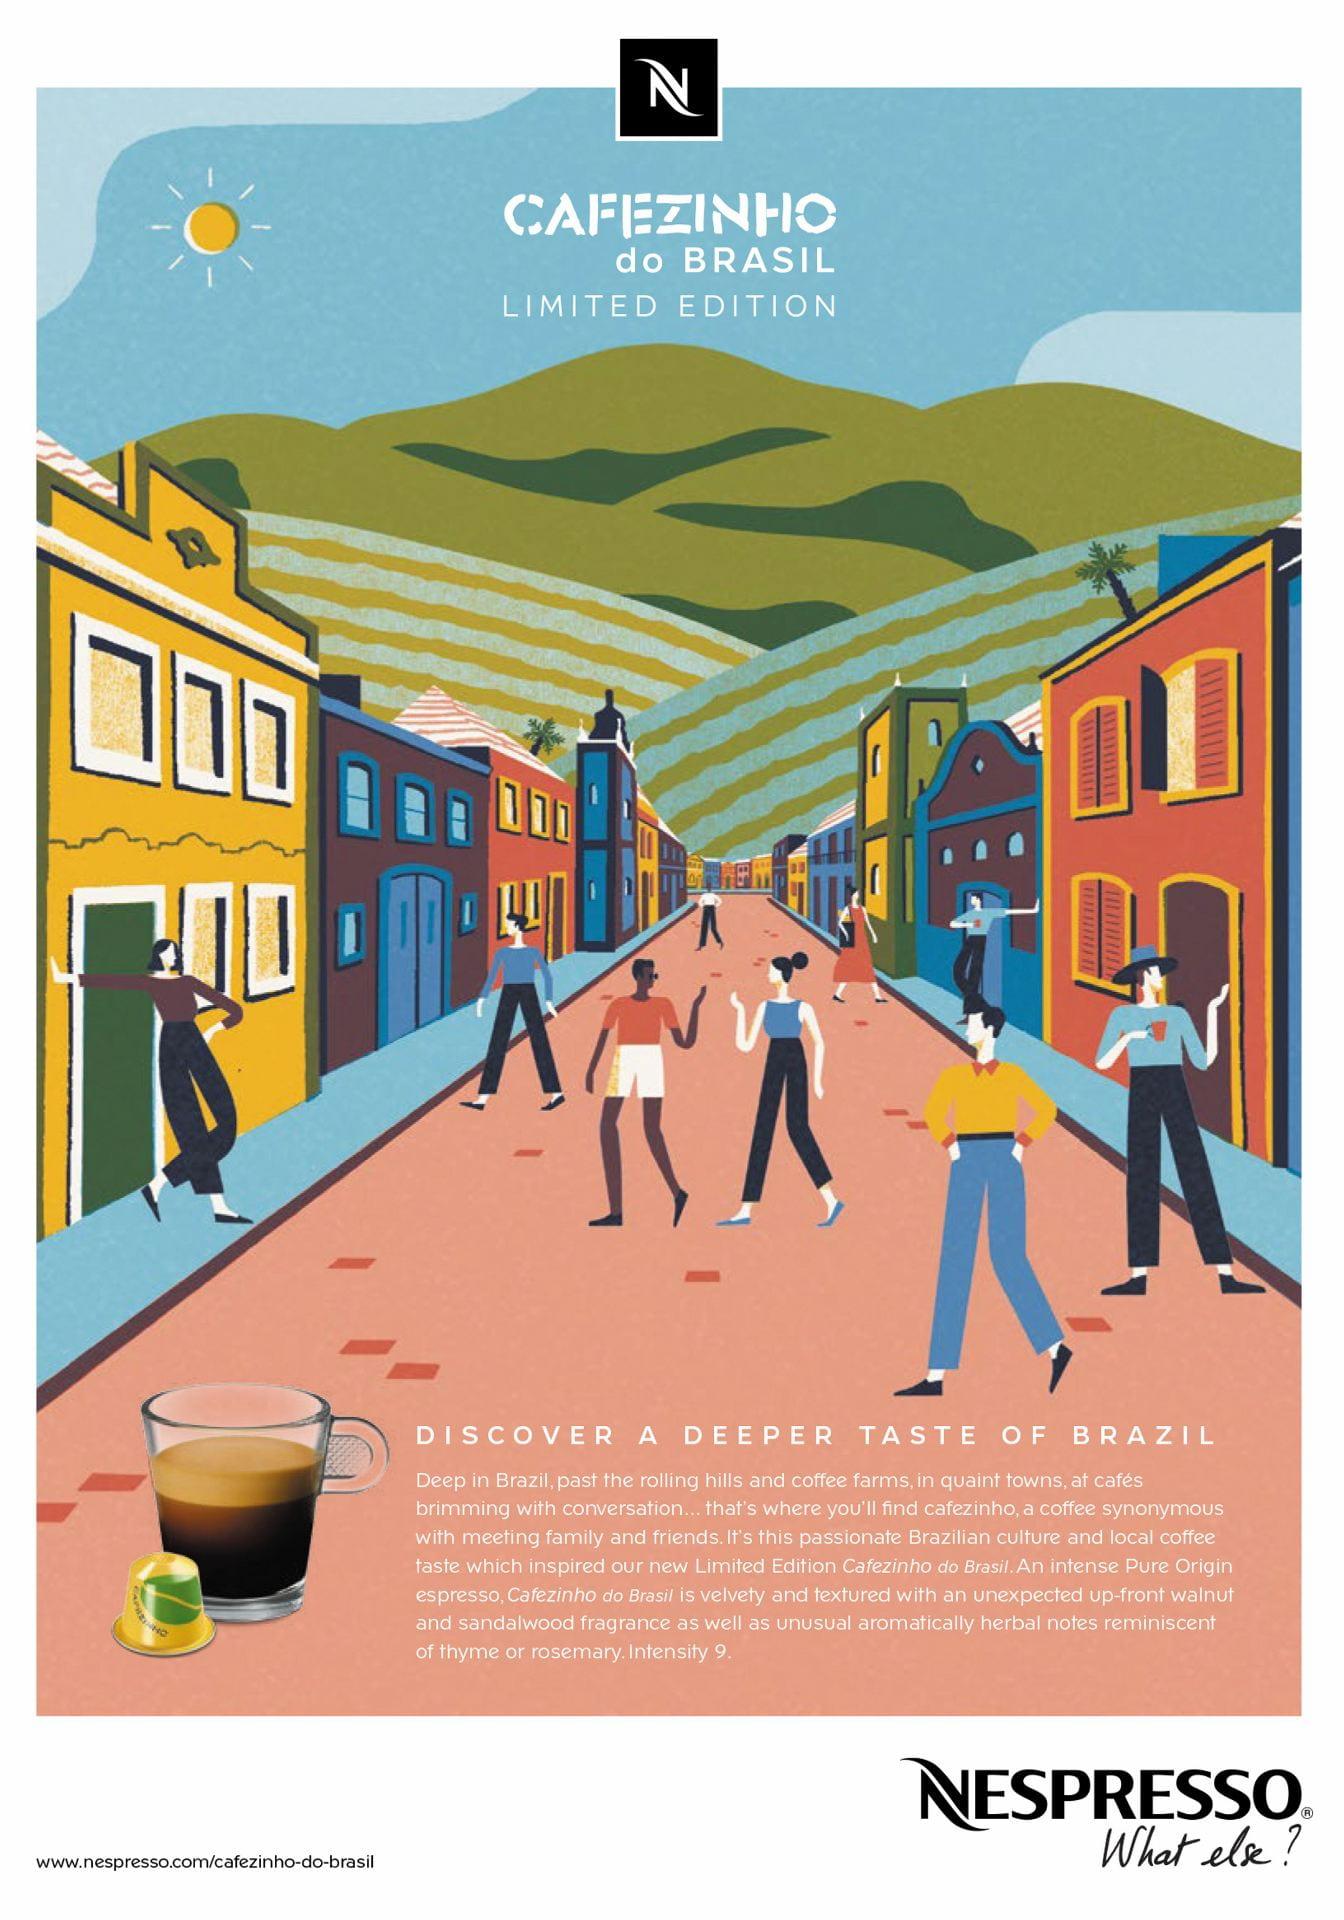 'Nespresso' Promotional Campaign